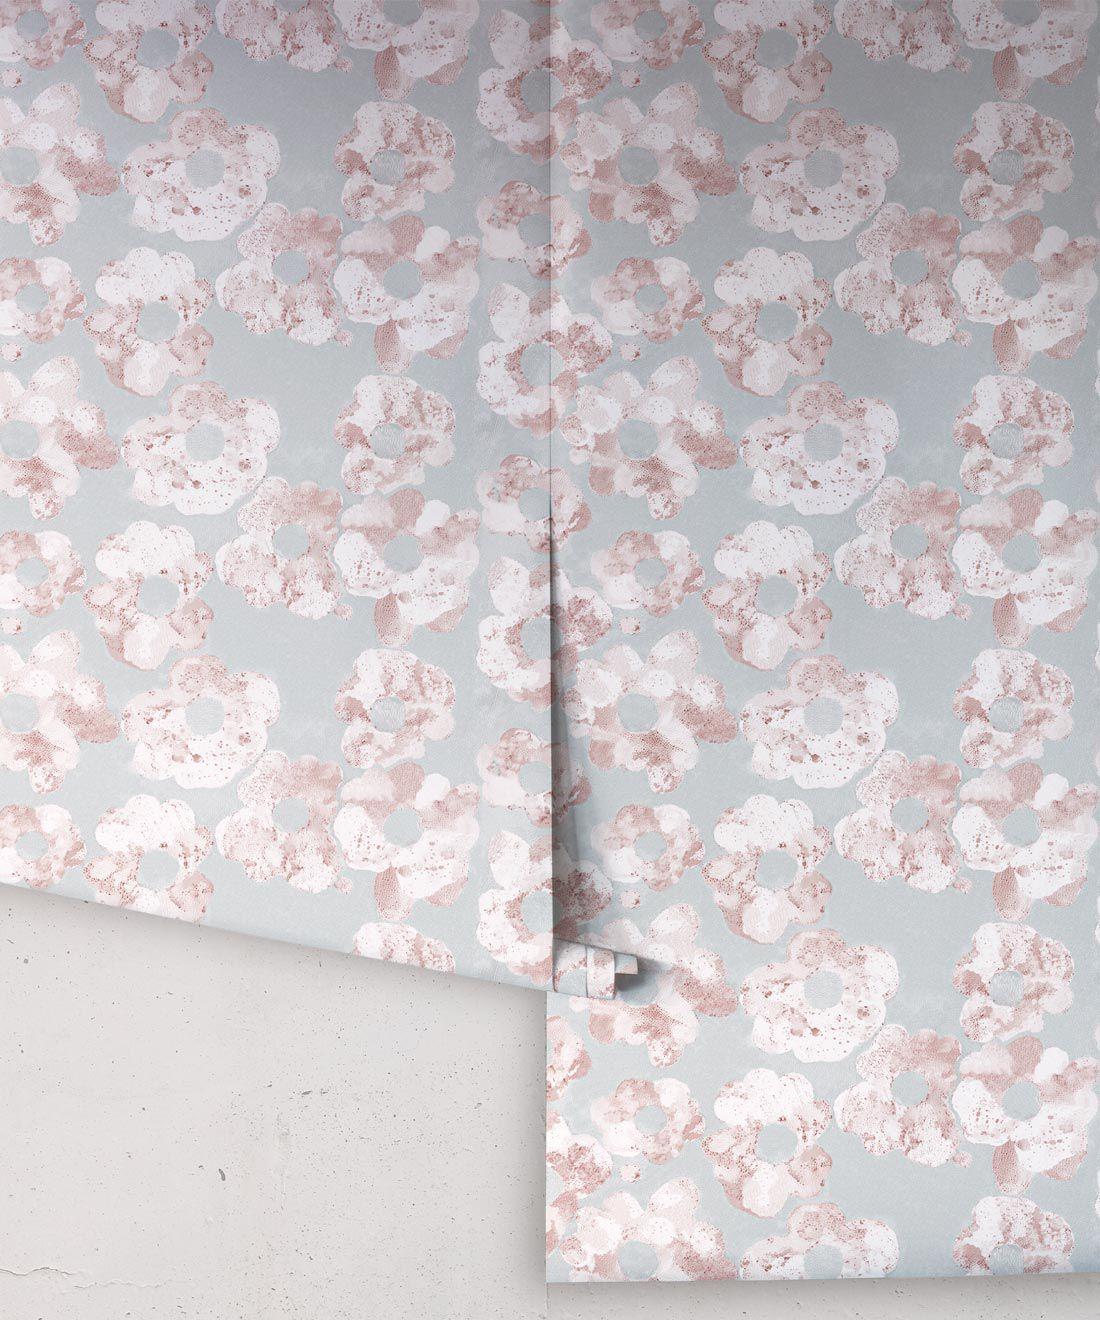 Cherry Blossom Wallpaper • Shibori Floral • Rolls Sage